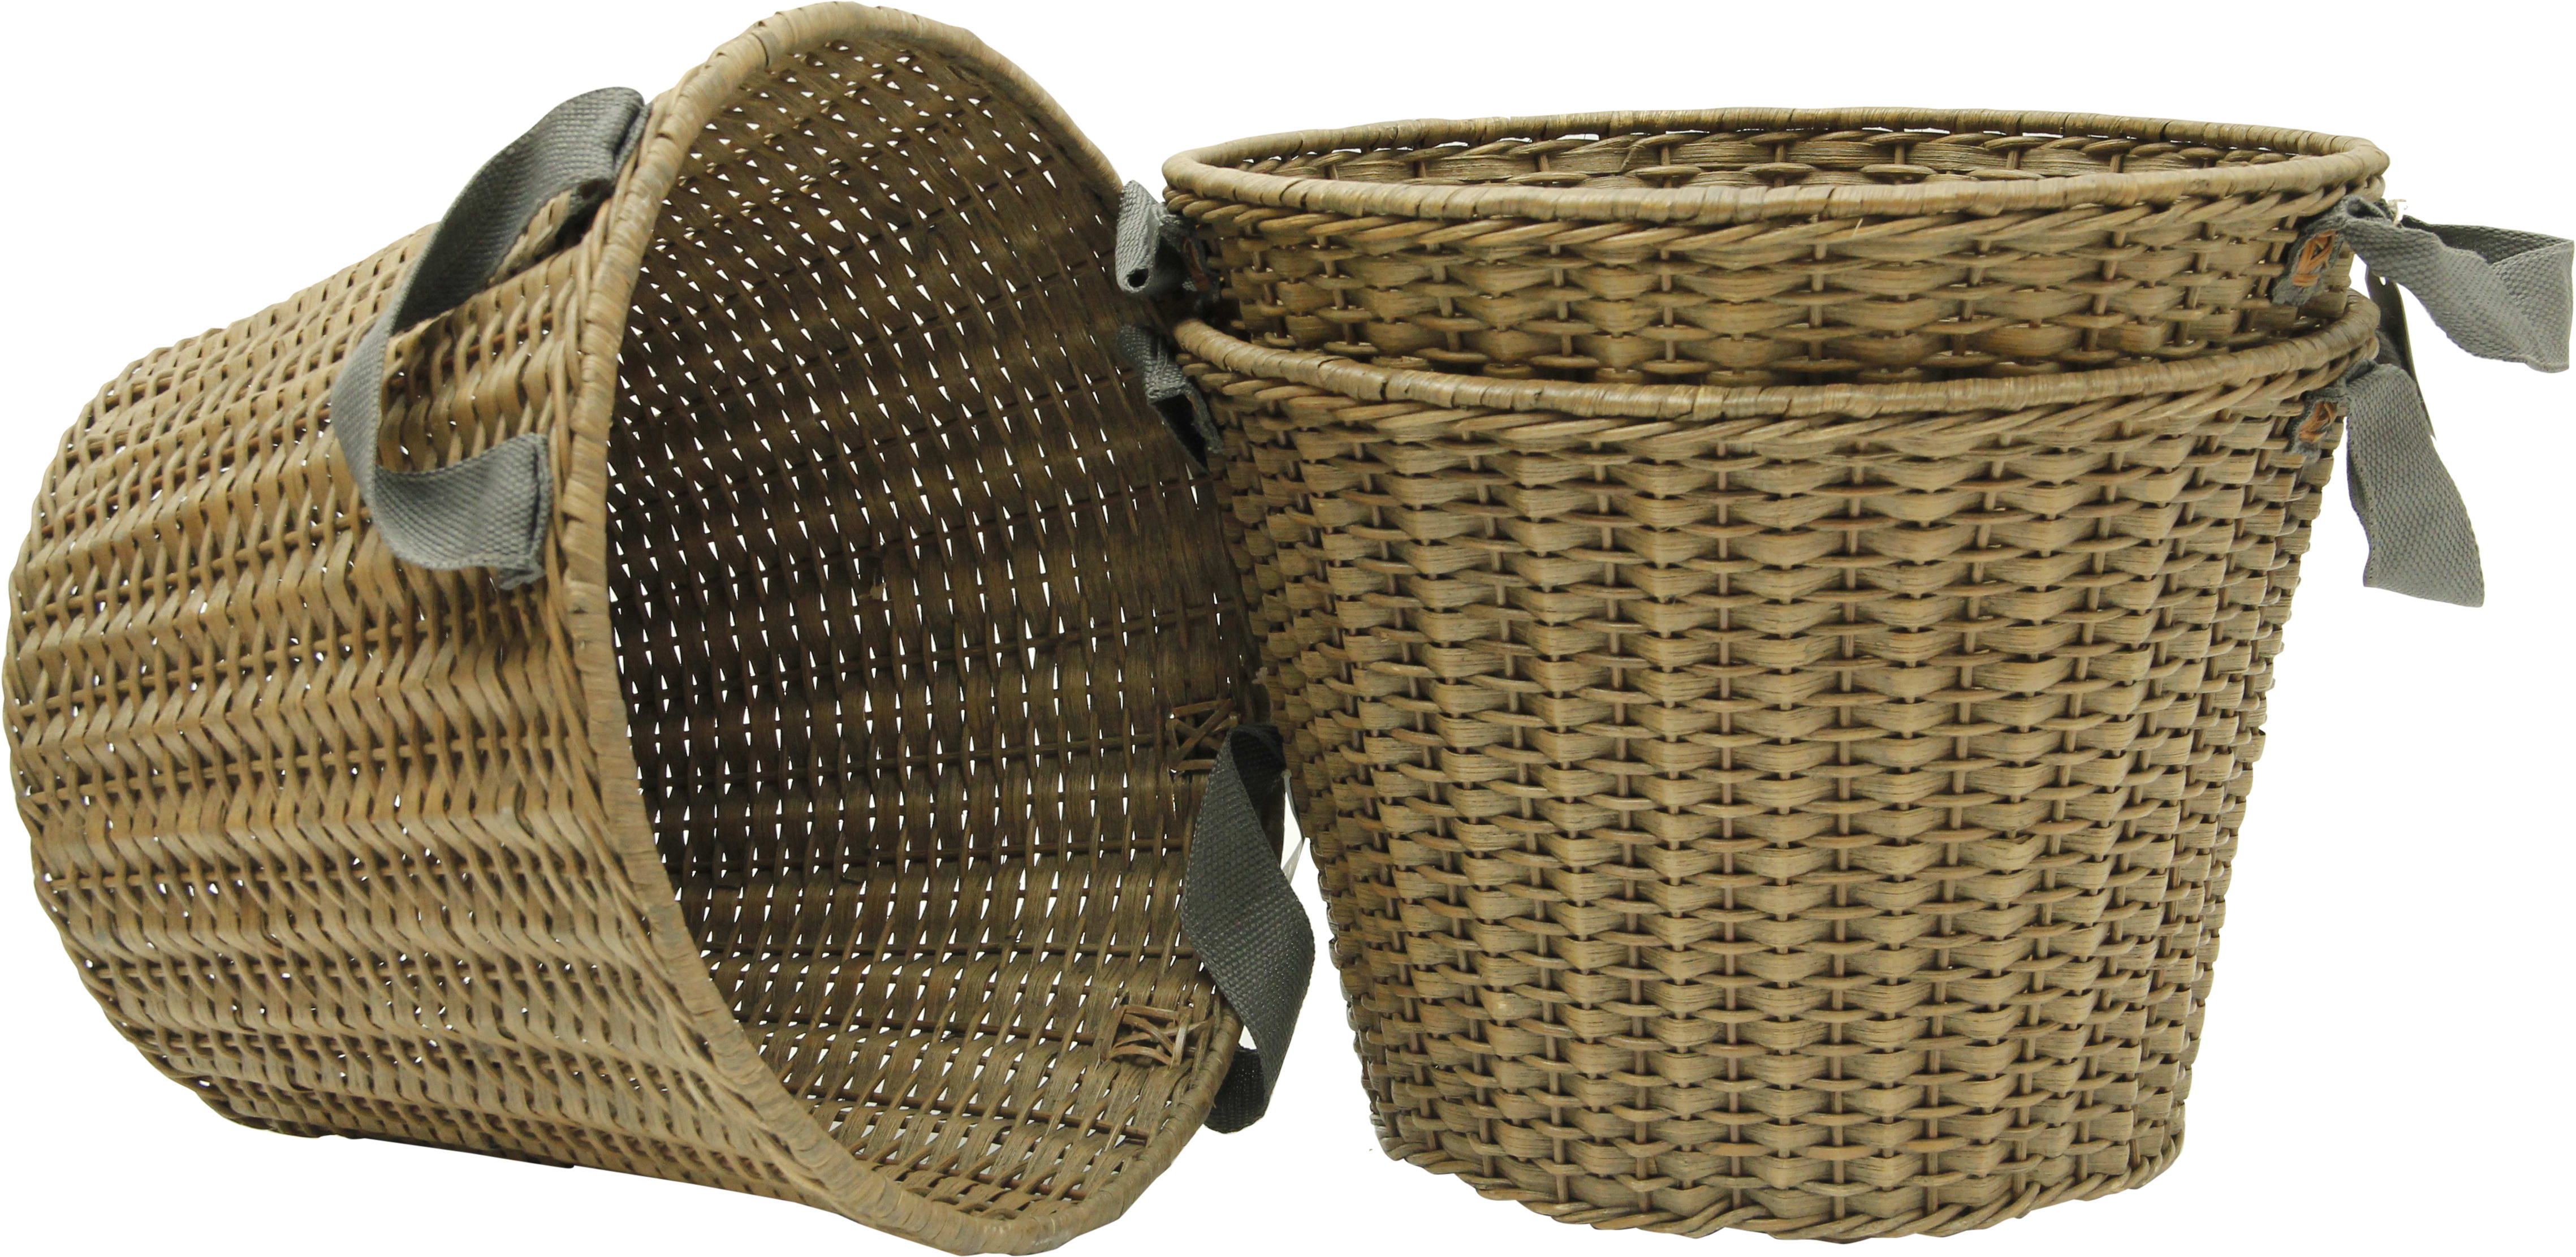 https://www.designidk.com/images/2286/tree-rattan-canvas-tapered-basket-445jpg